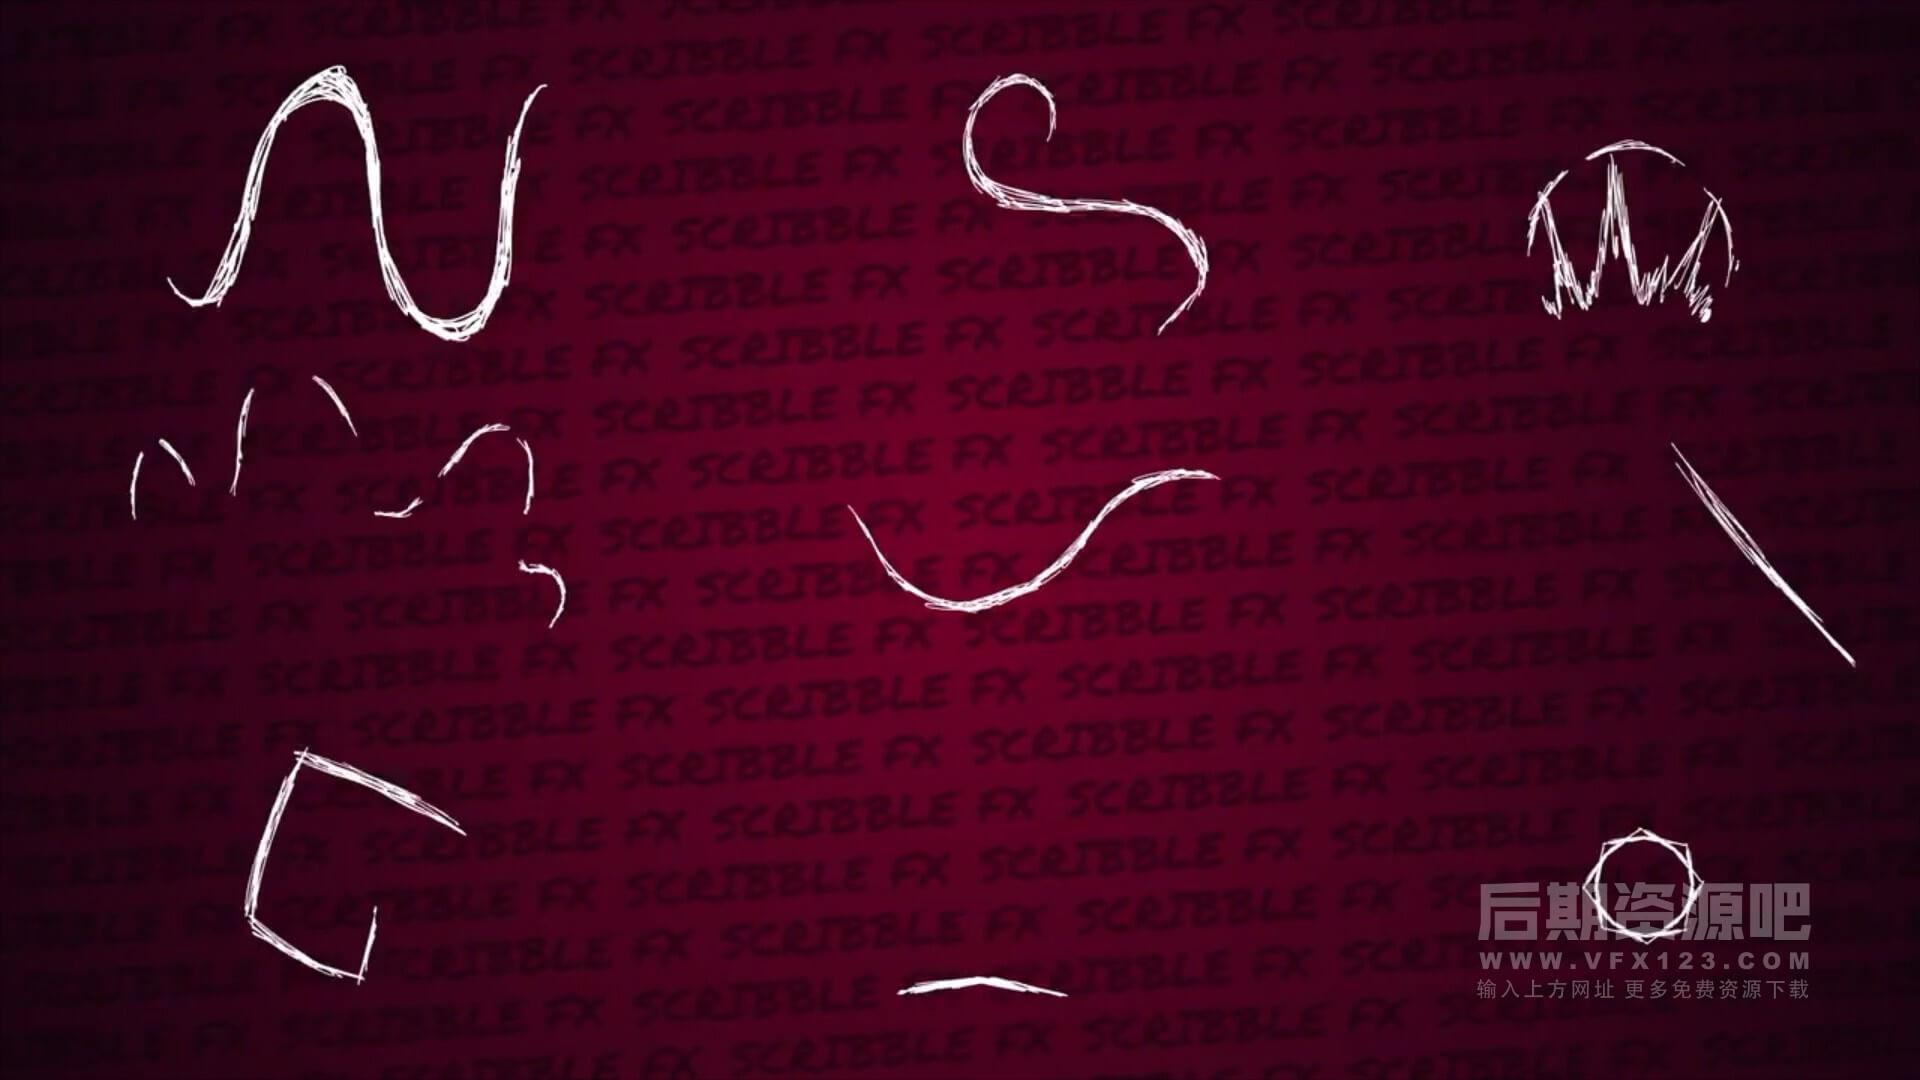 fcpx插件 22个炫酷涂鸦装饰动画元素 支持fcpx 10.5.1 Scribble Elements